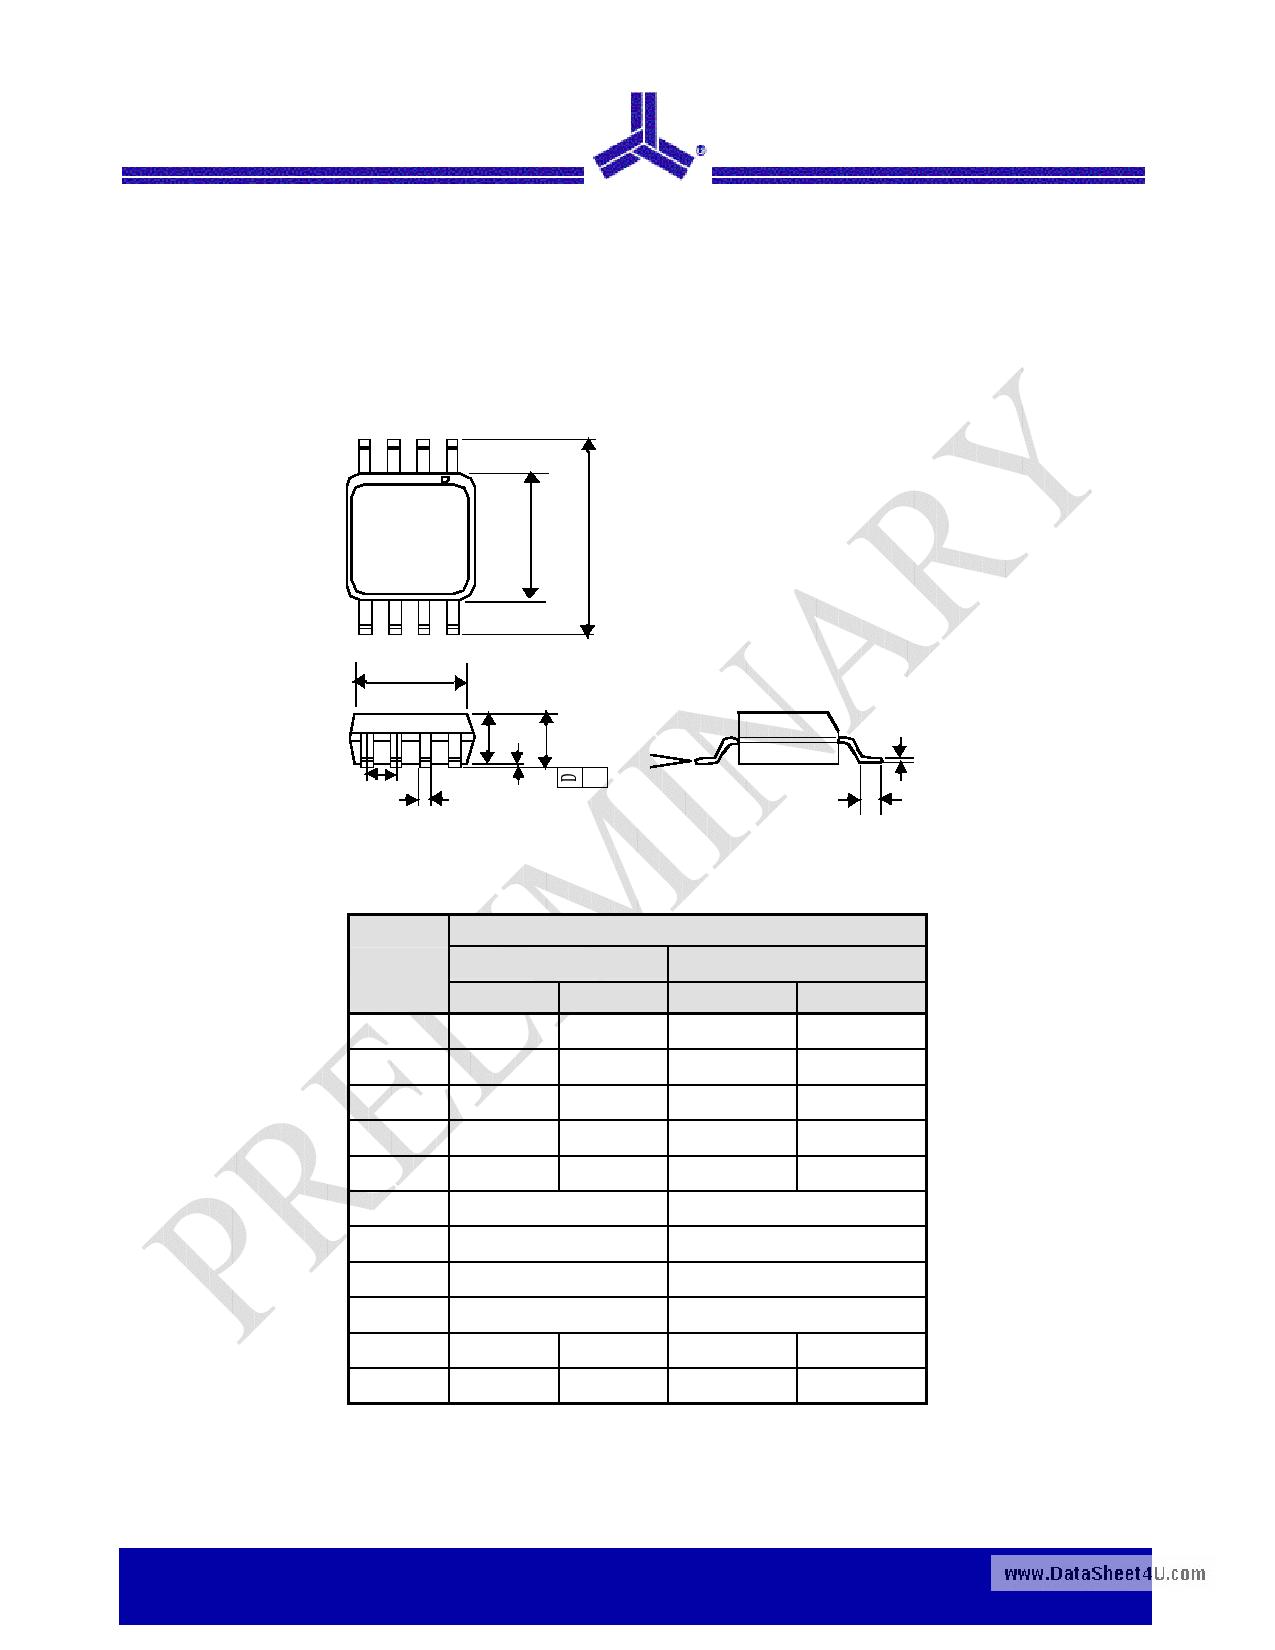 ASM3P2853A 電子部品, 半導体